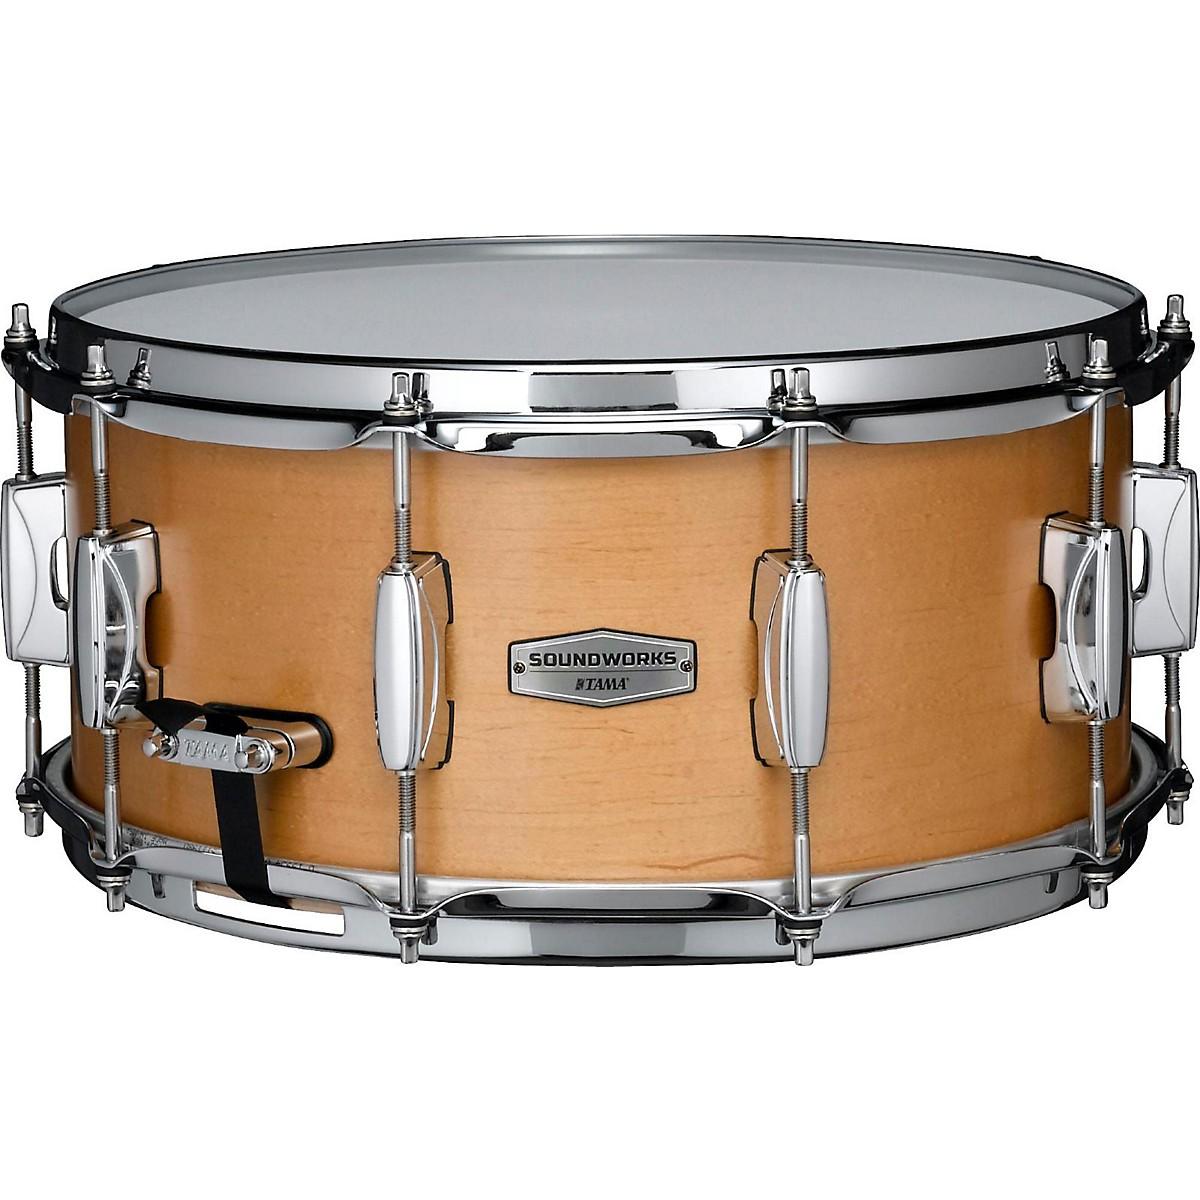 TAMA Soundworks Maple Snare Drum